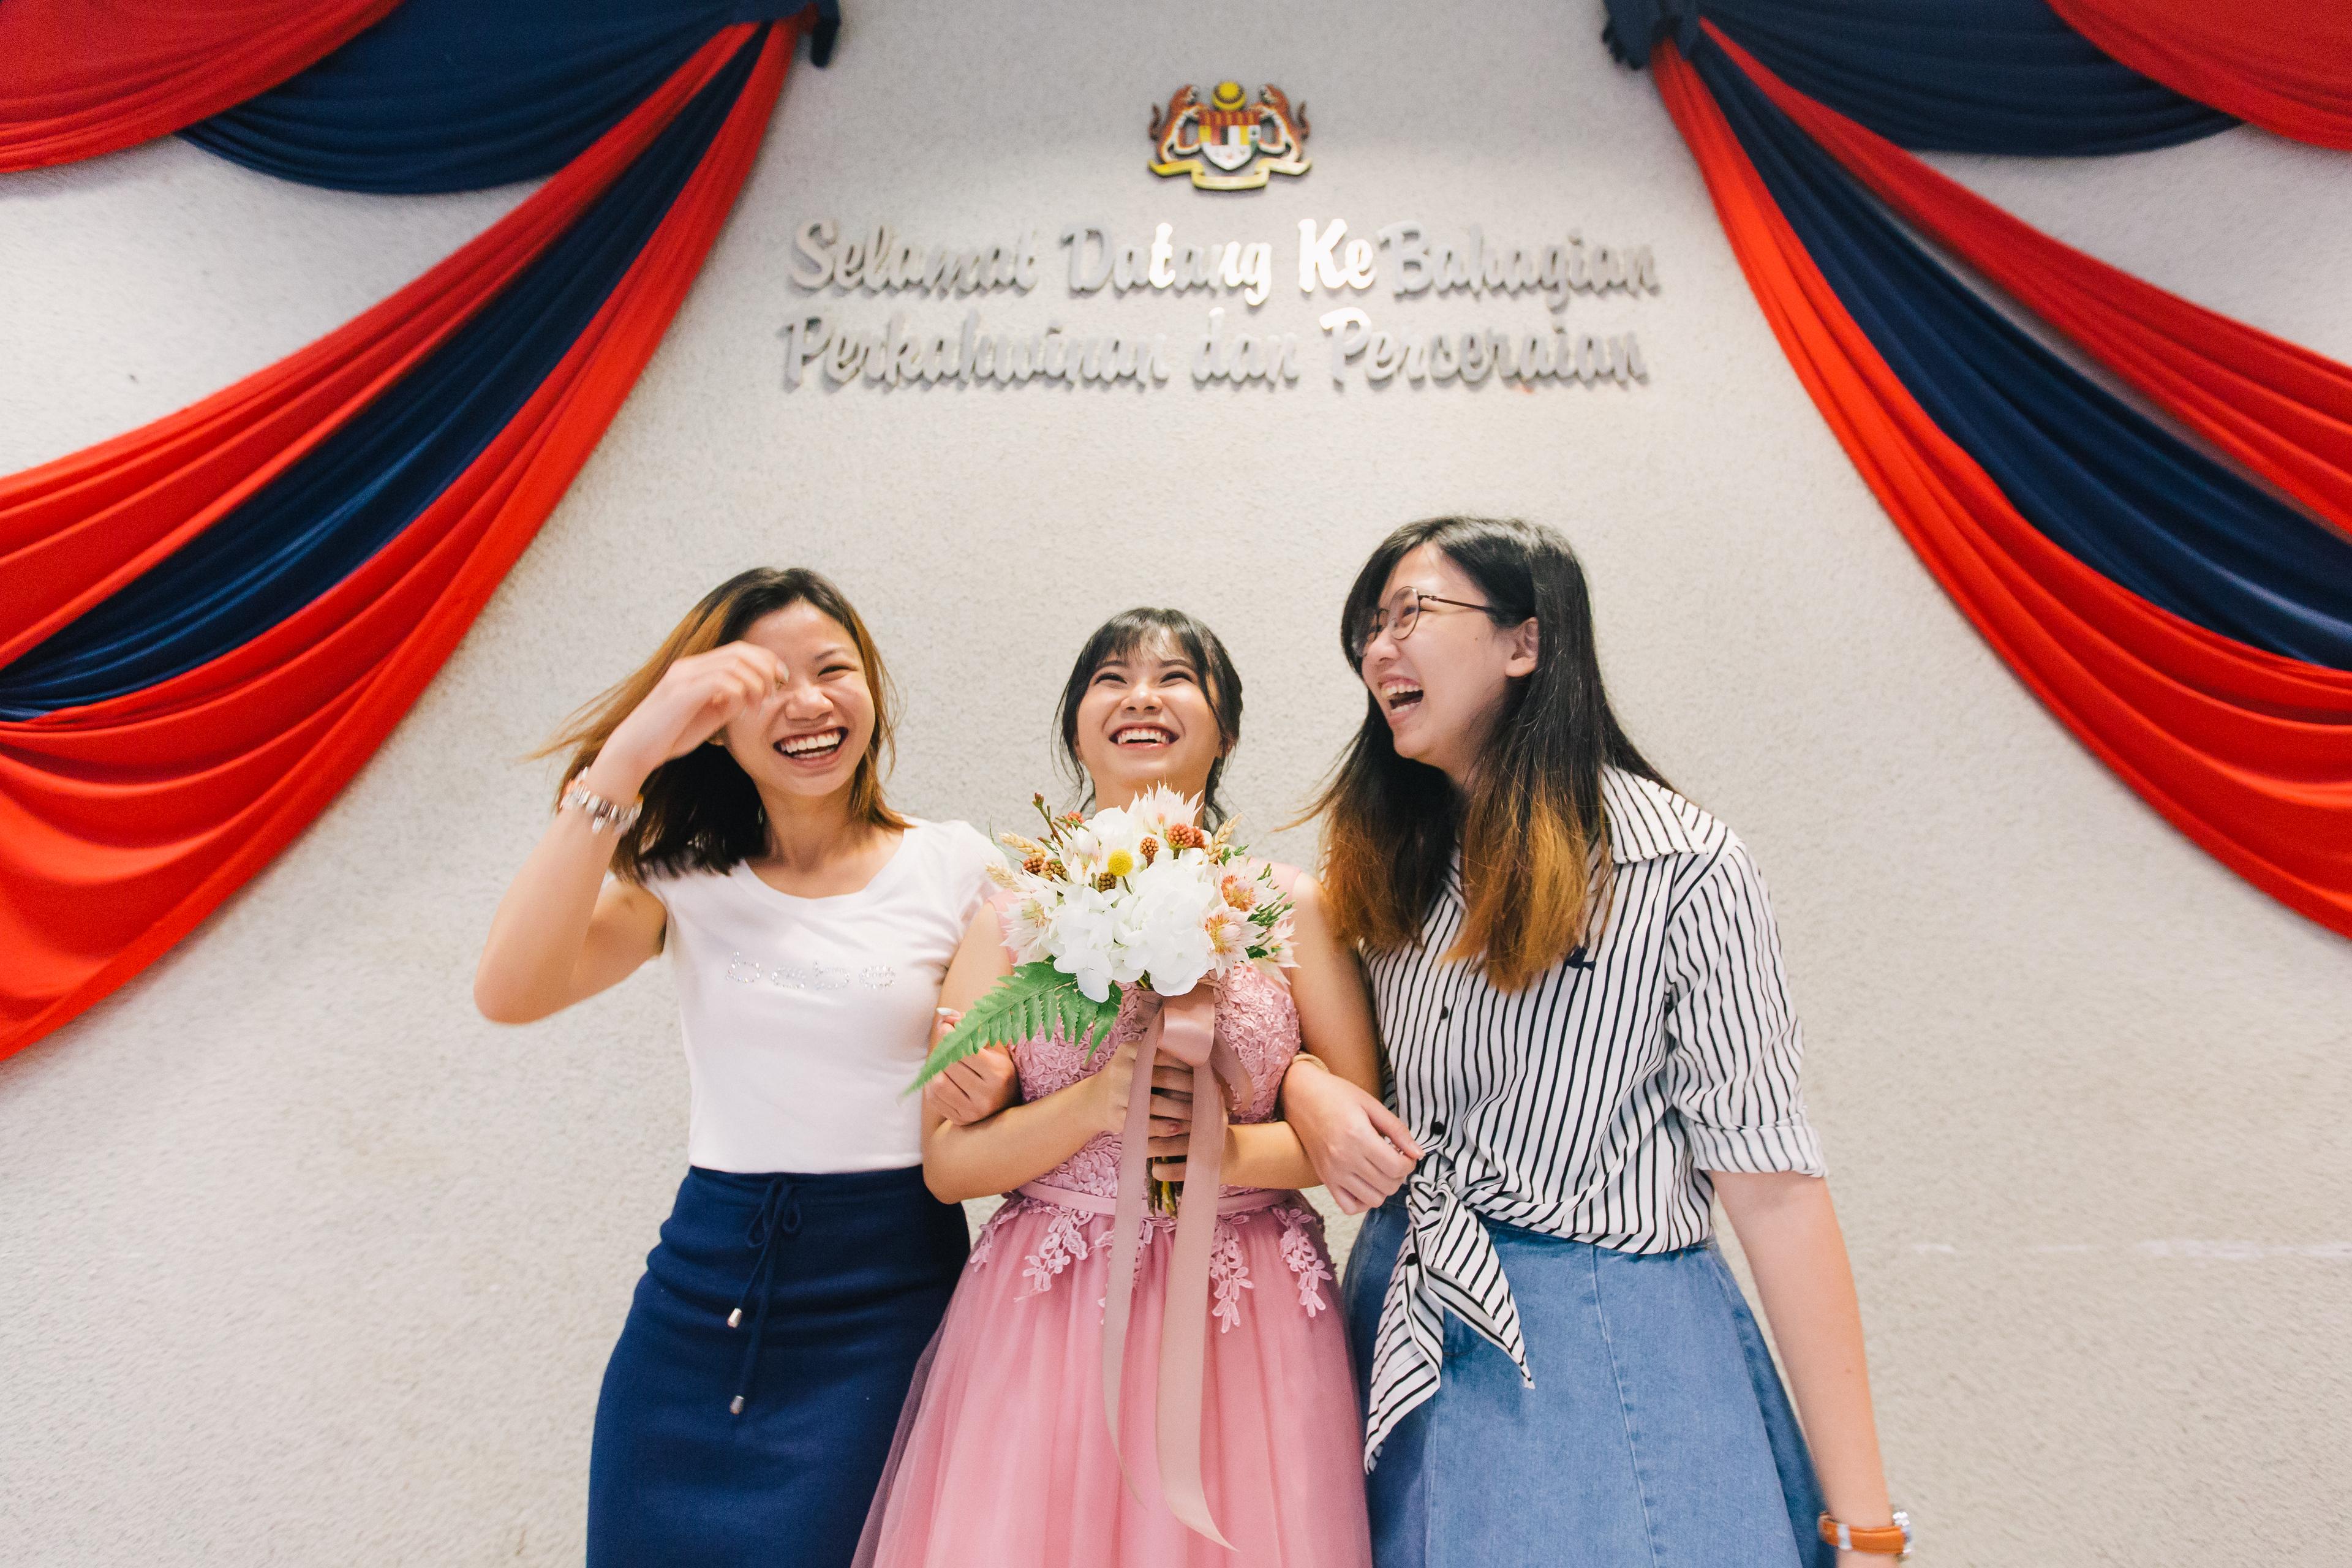 Rom in Putrajaya National Registration Department JPN, Malaysia